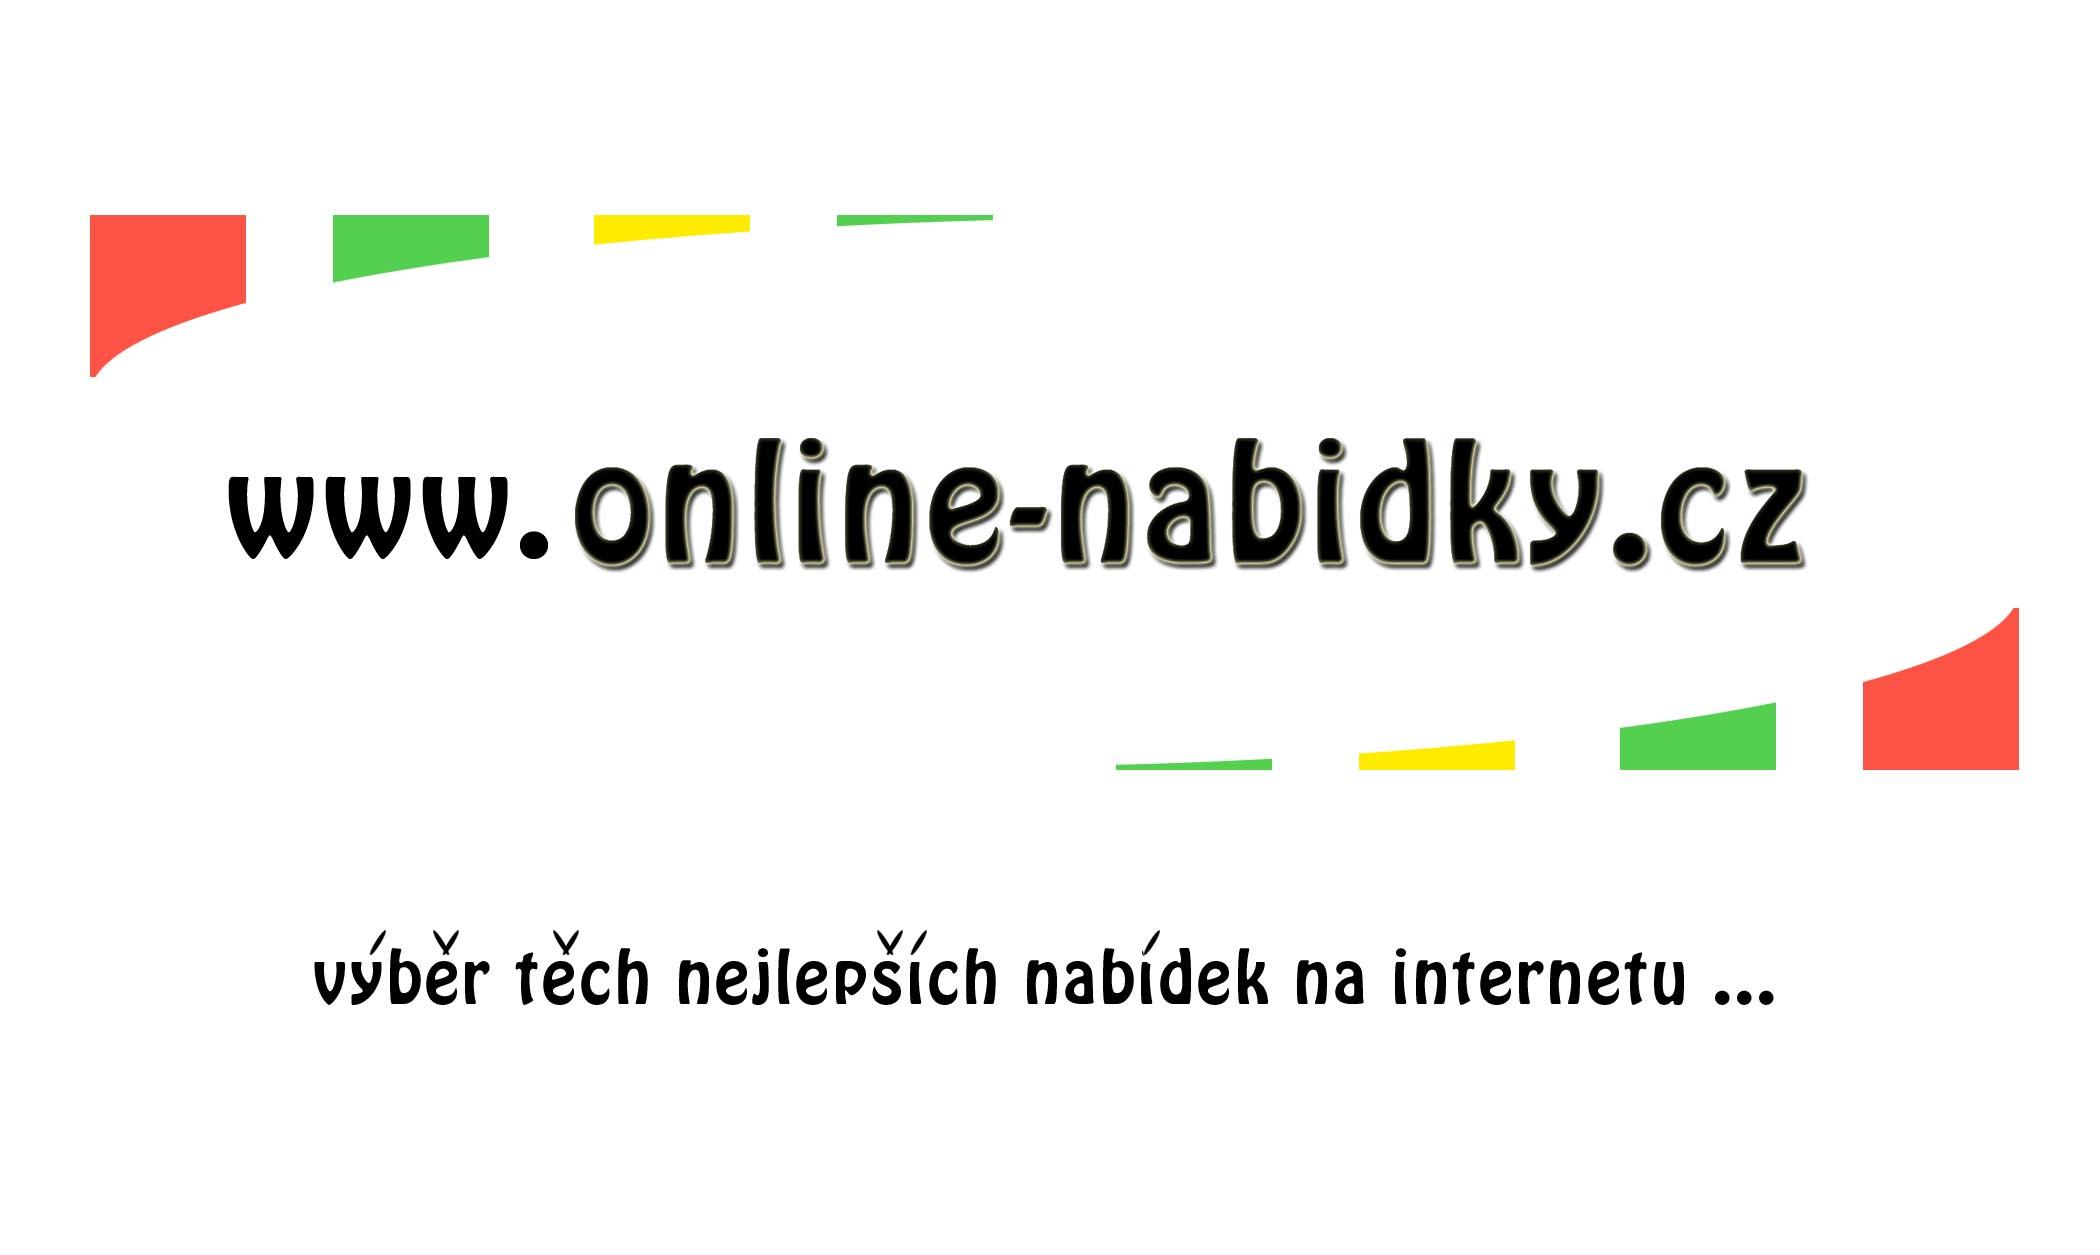 http://www.online-nabidky